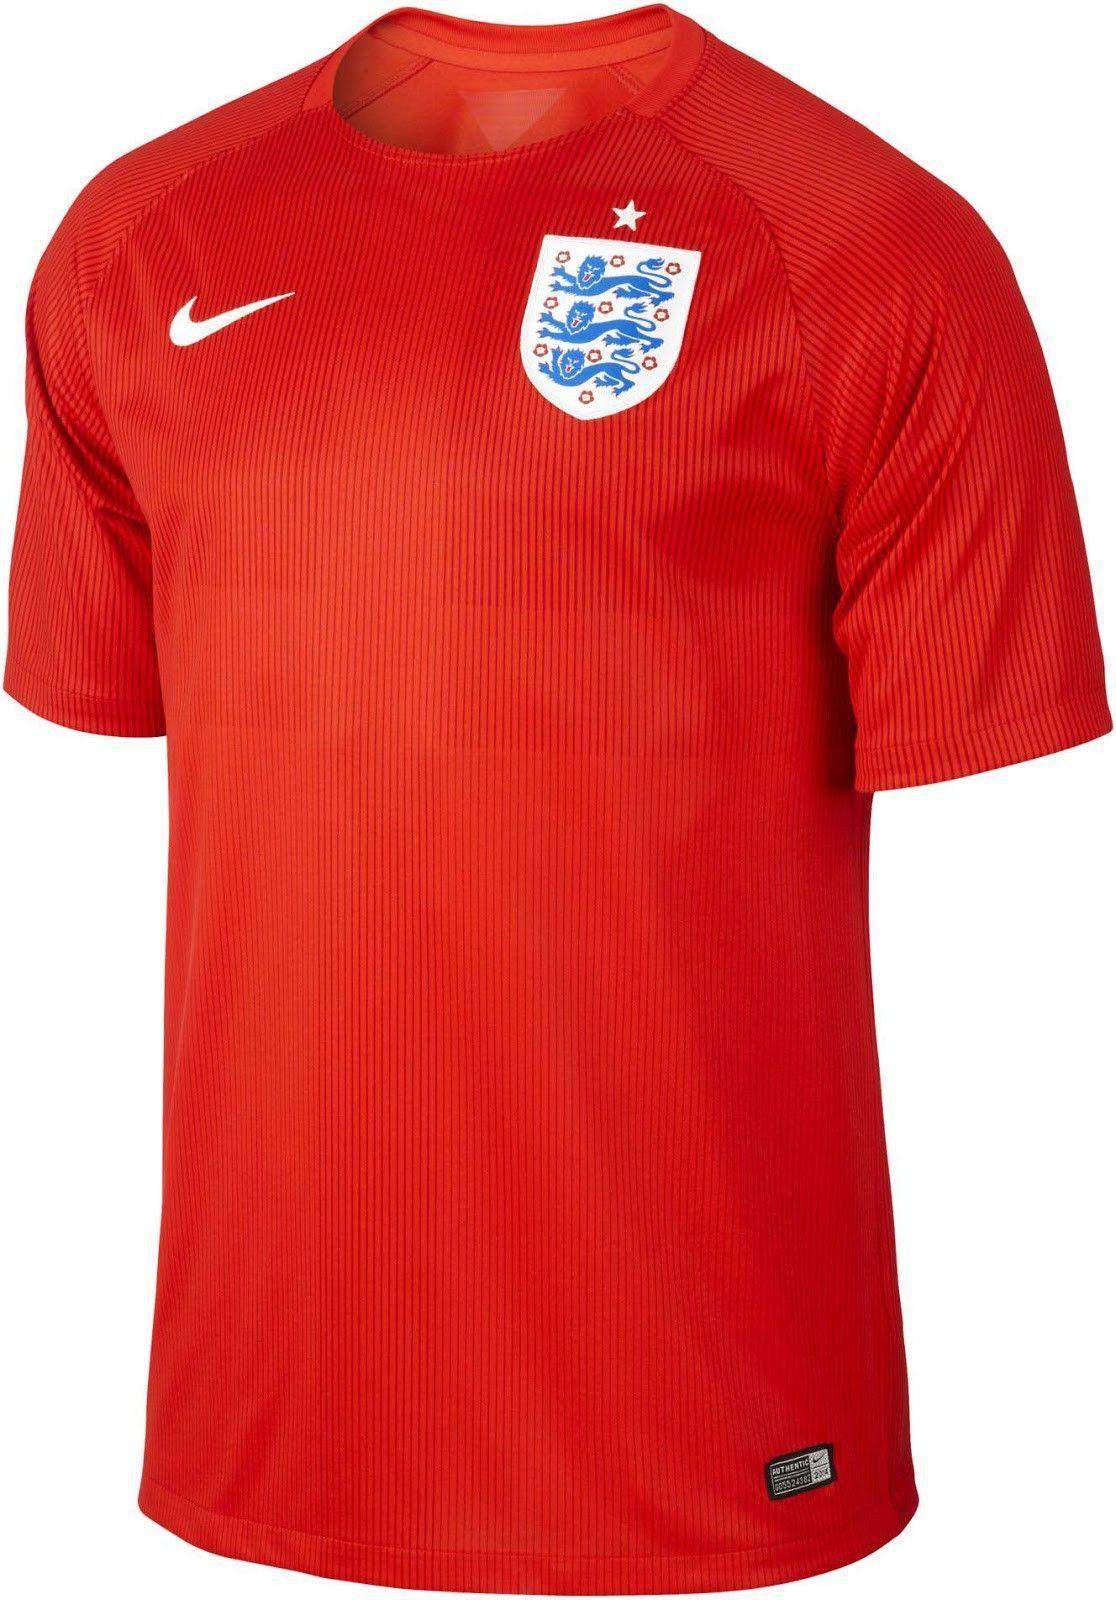 Nike USA Away Jersey 2014 World Cup   Usa soccer team